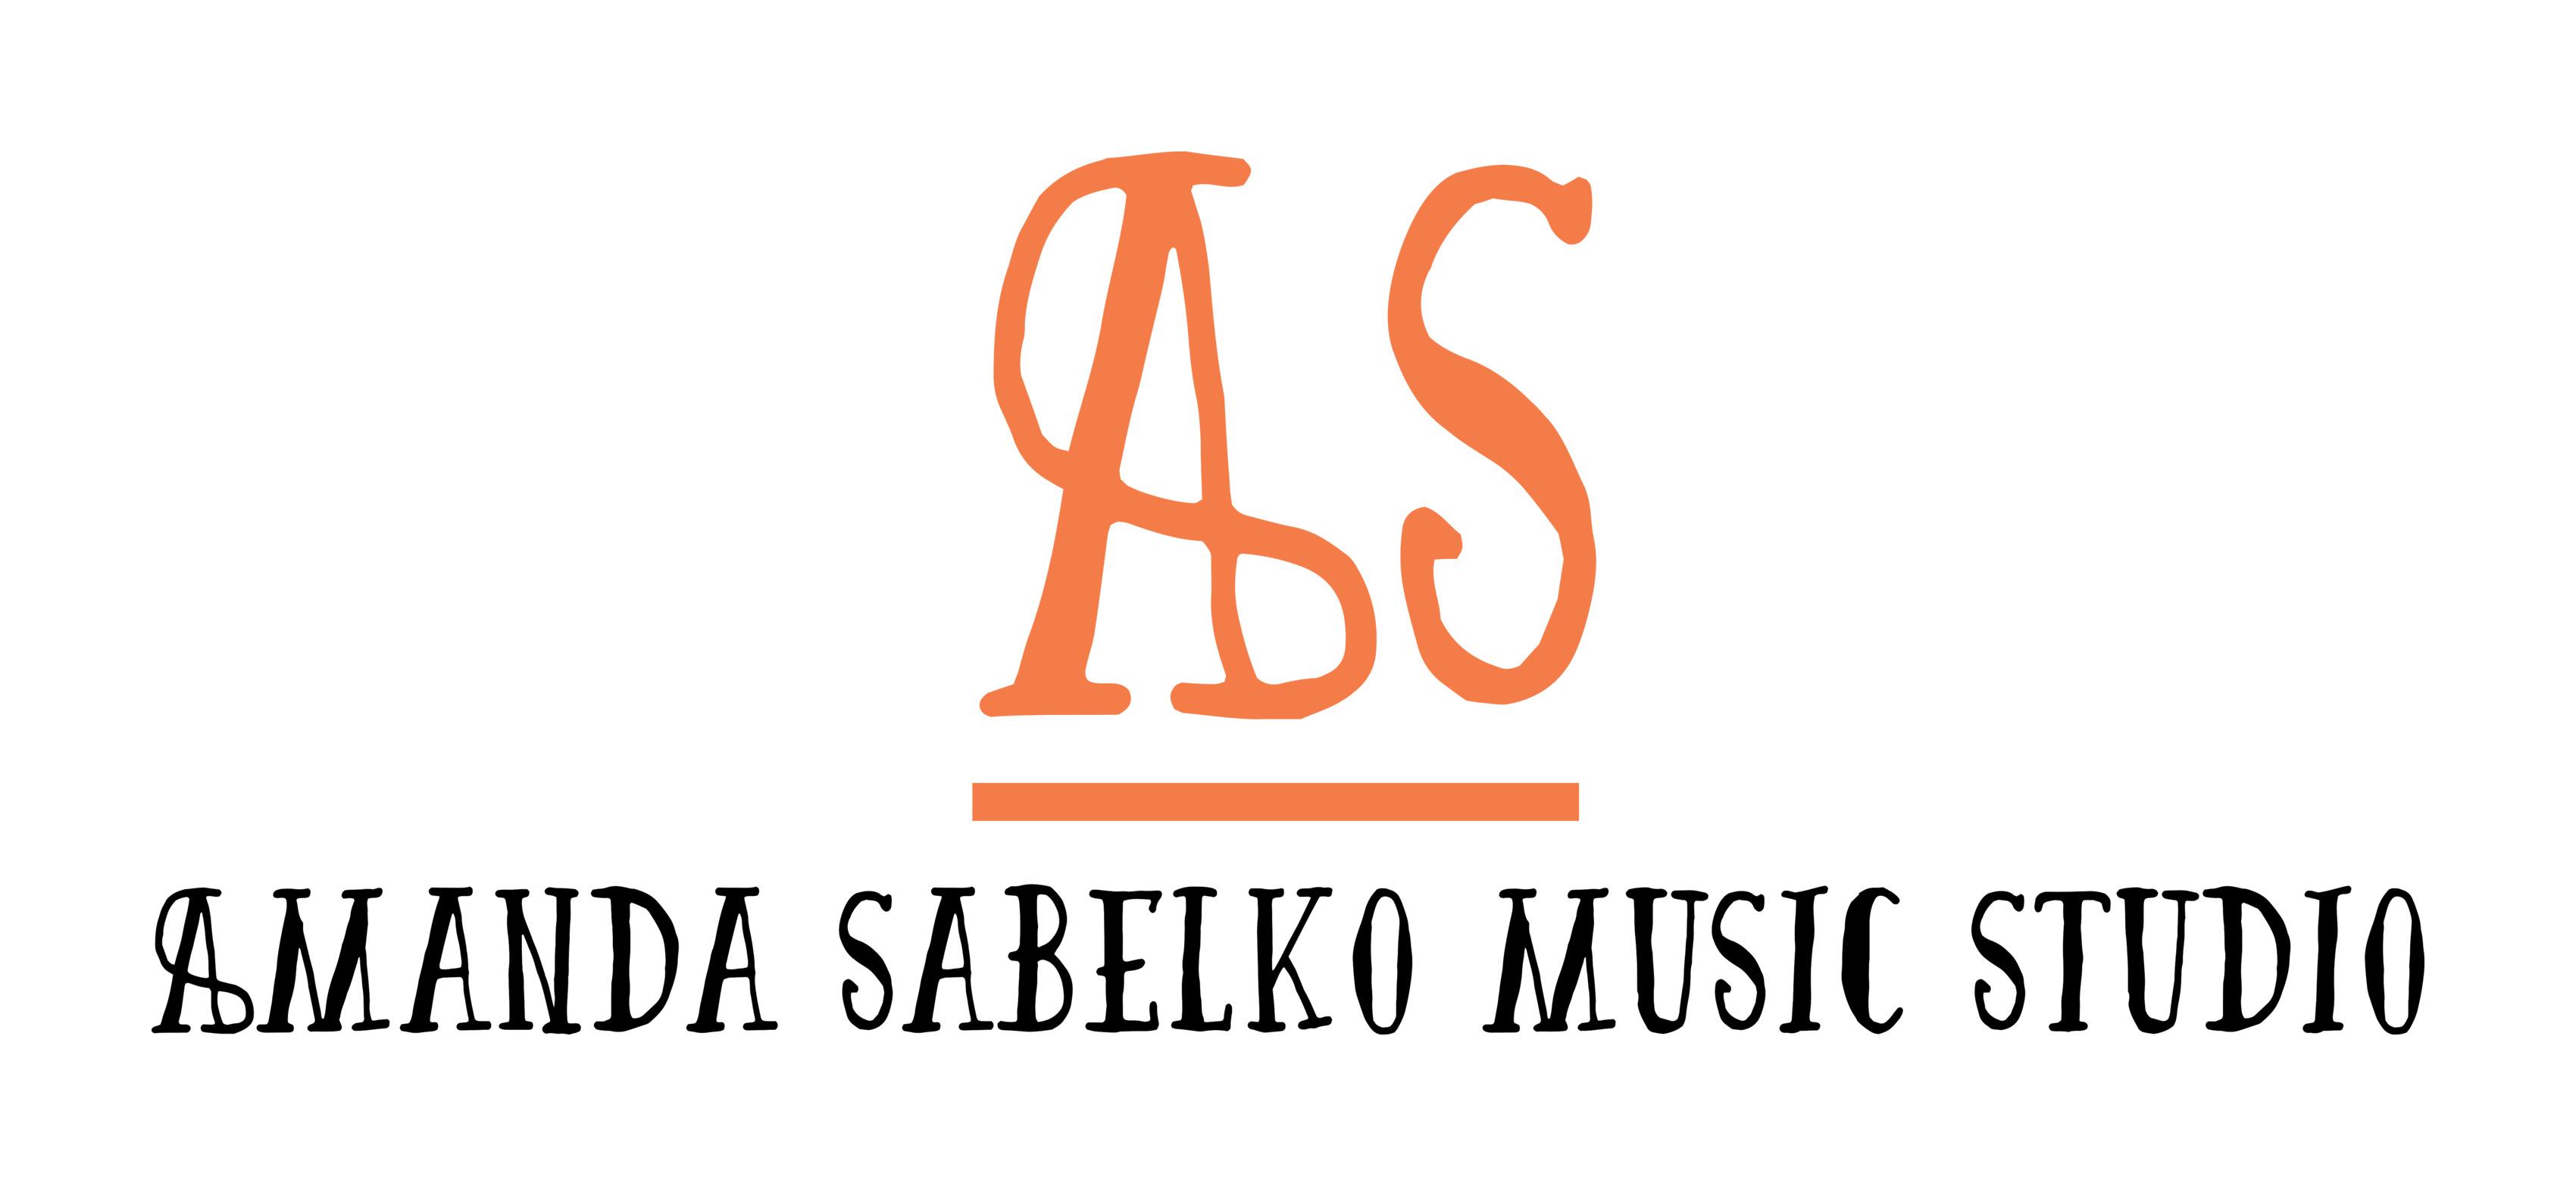 amanda sabelko music studio